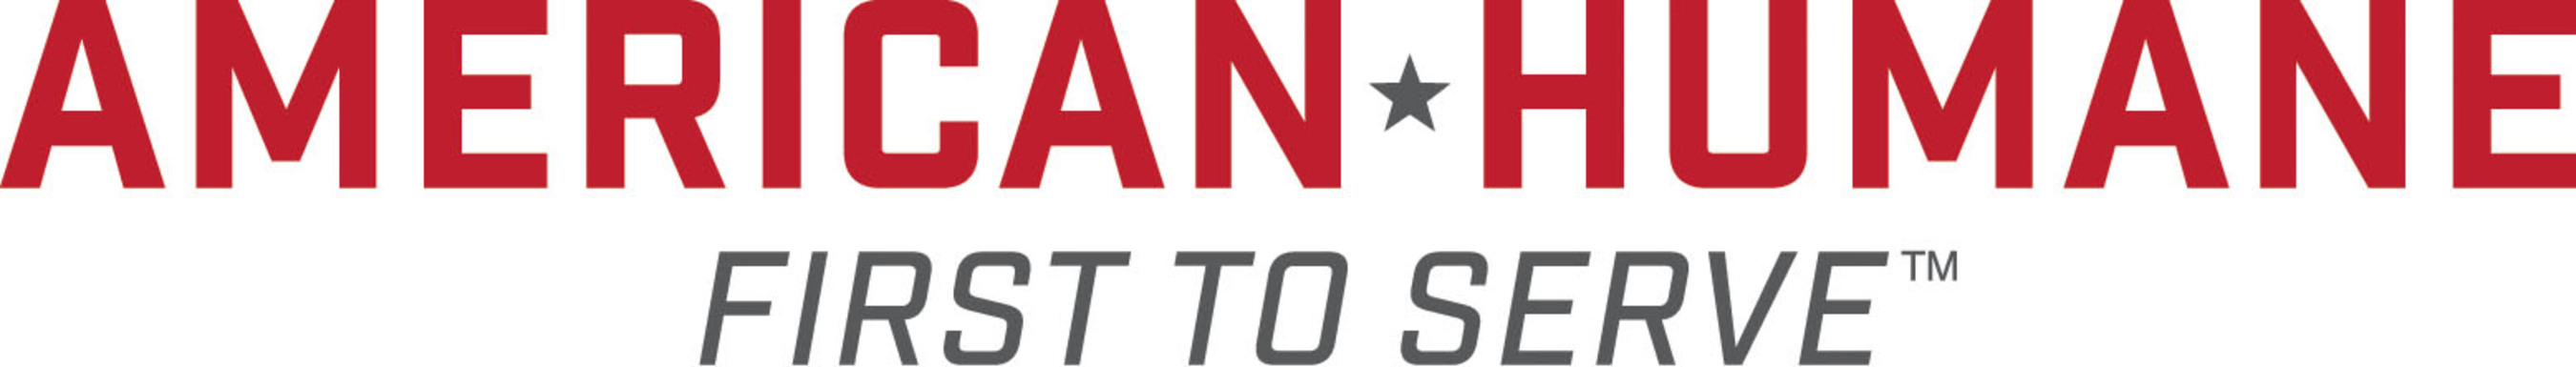 American Humane Association logo.